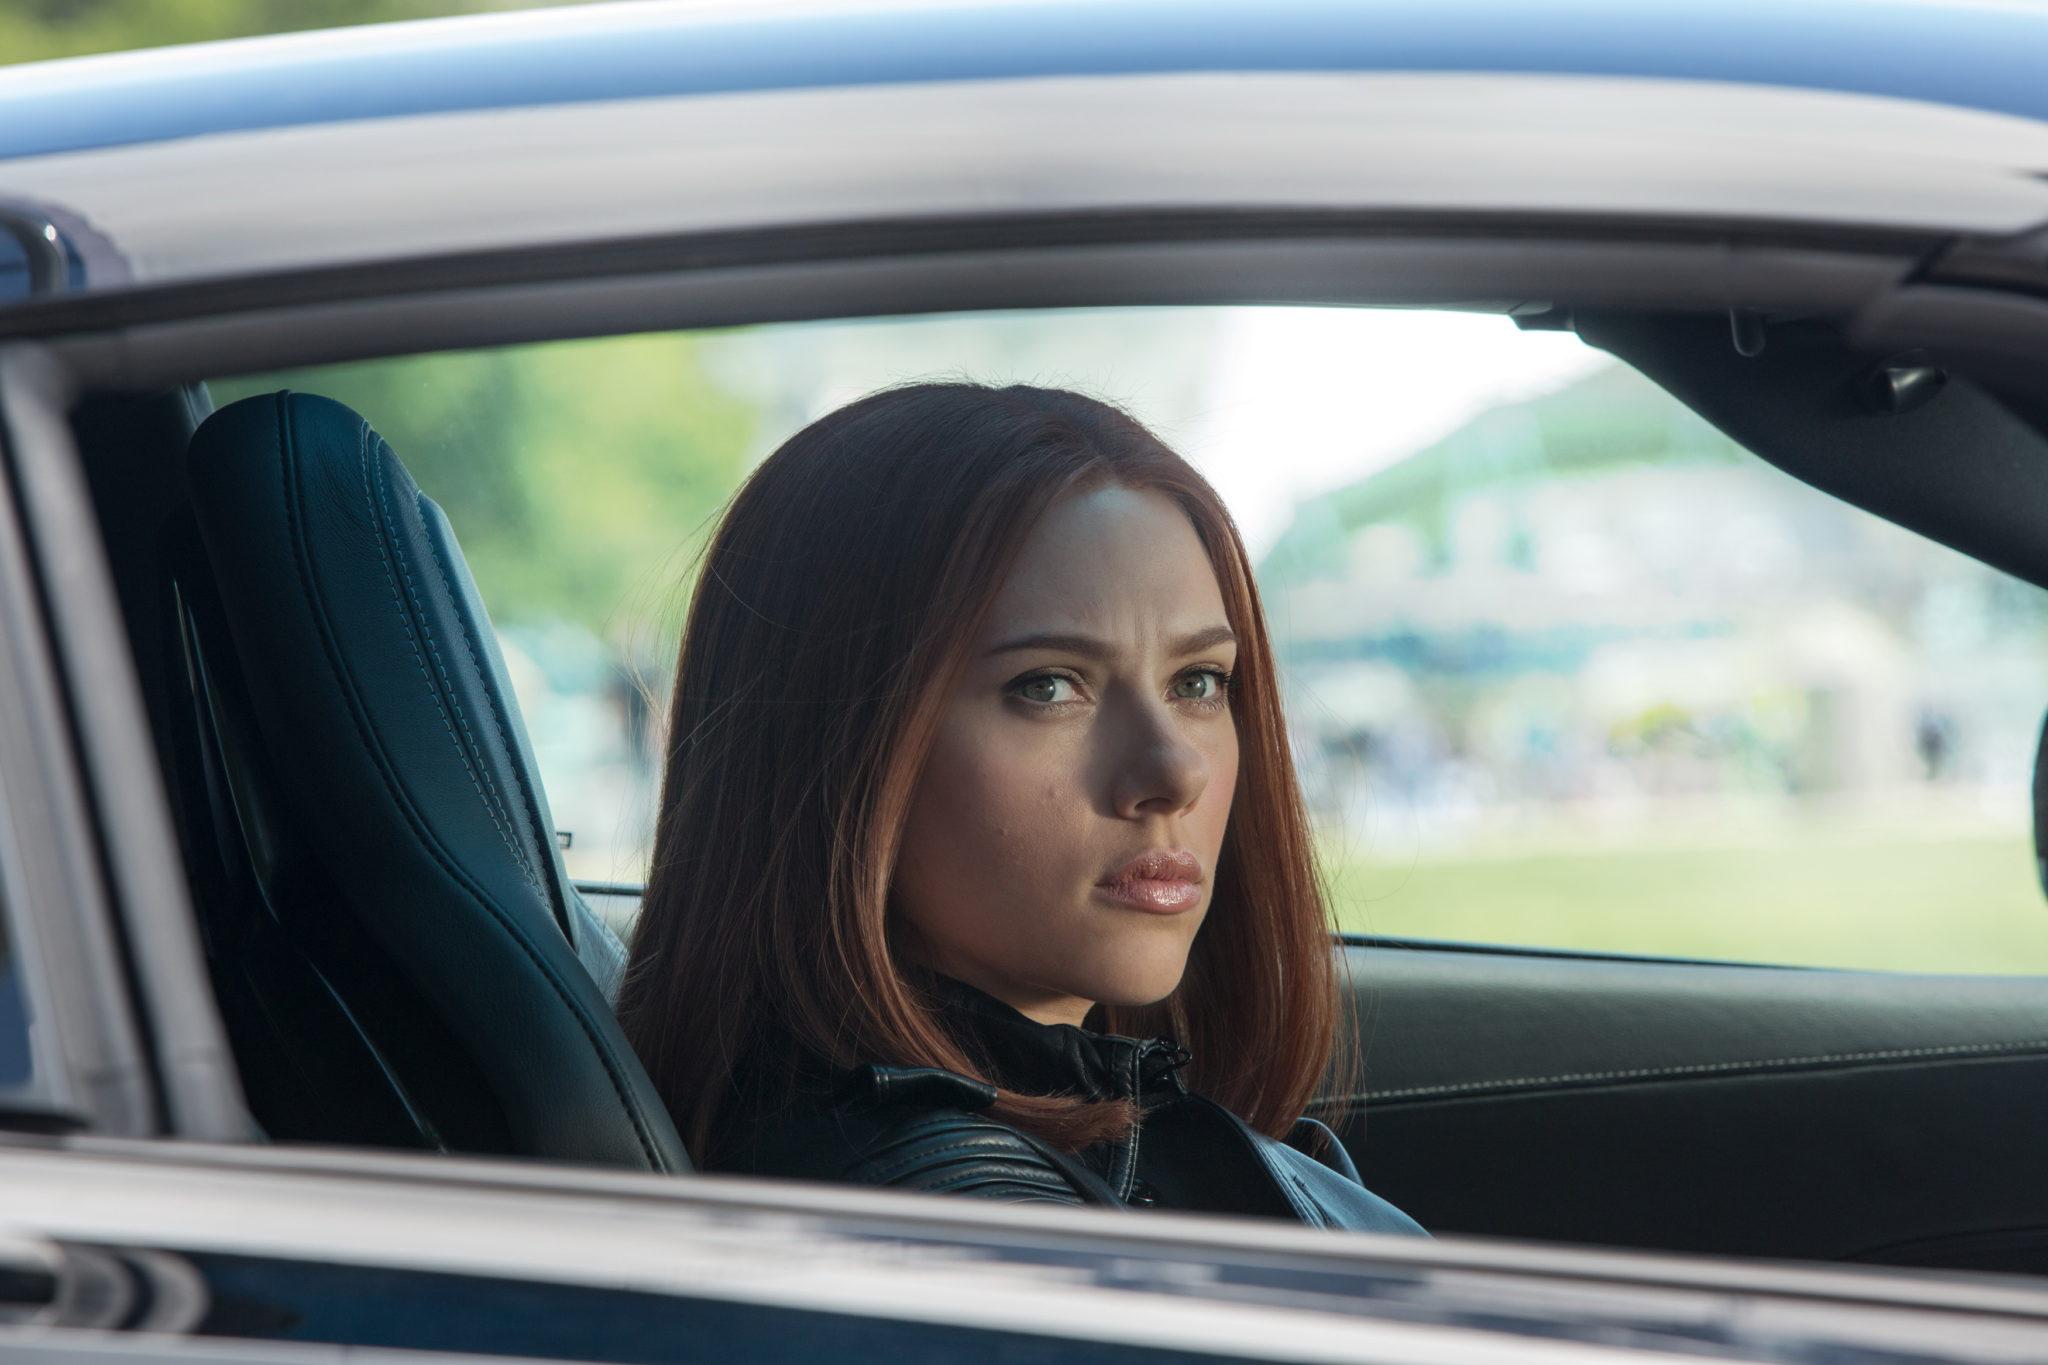 Black Widow Scarlet Johansson